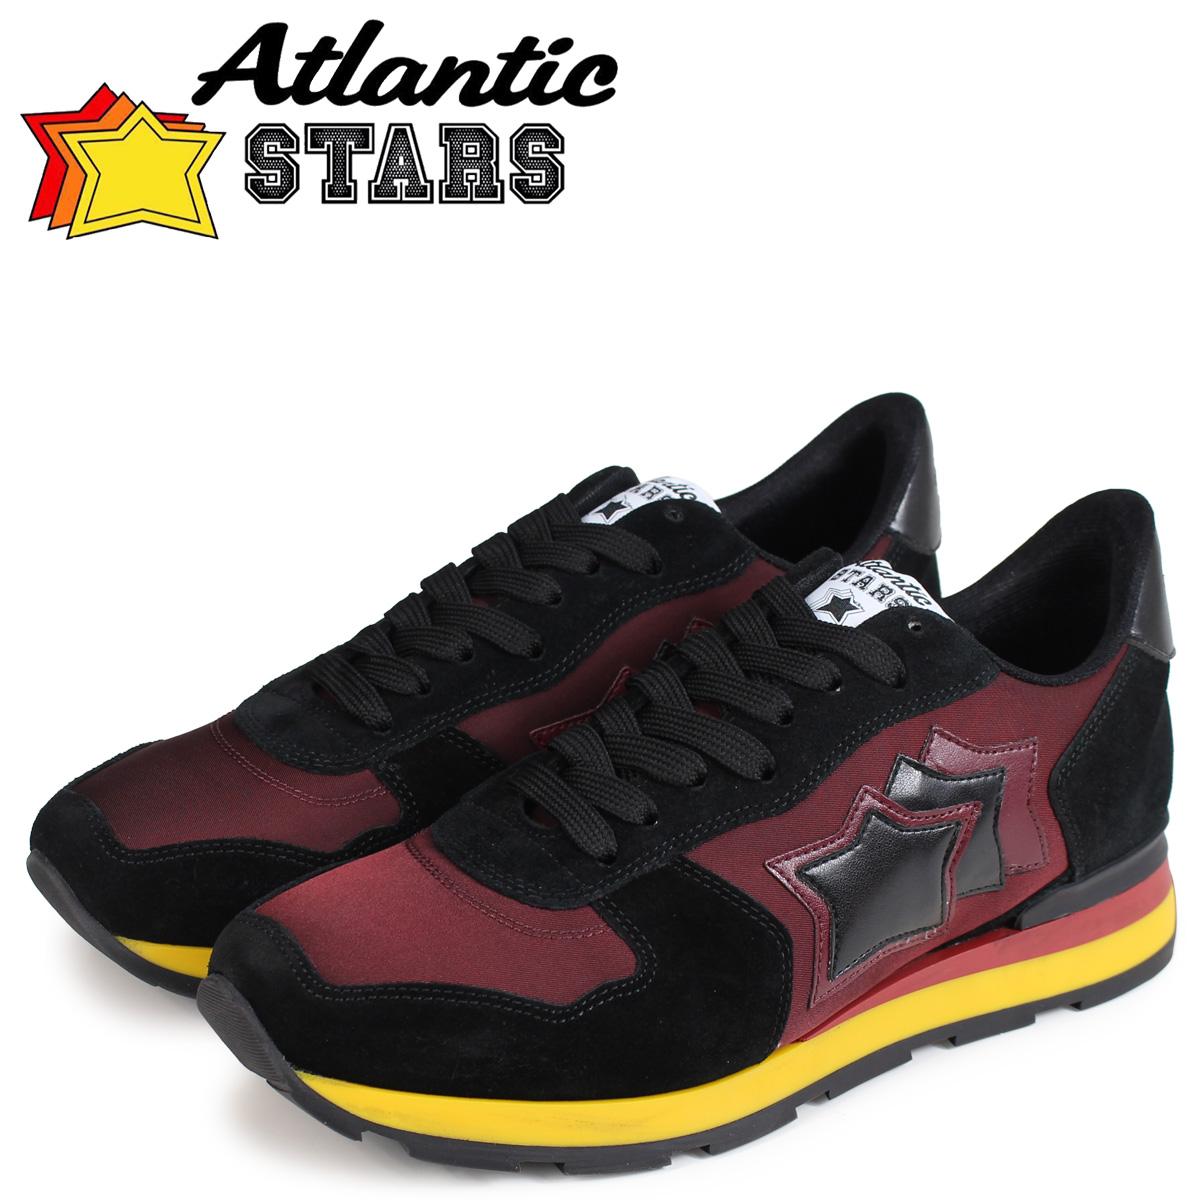 Atlantic STARS メンズ スニーカー アトランティックスターズ アンタレス ANTARES BON-02N ブラック 黒